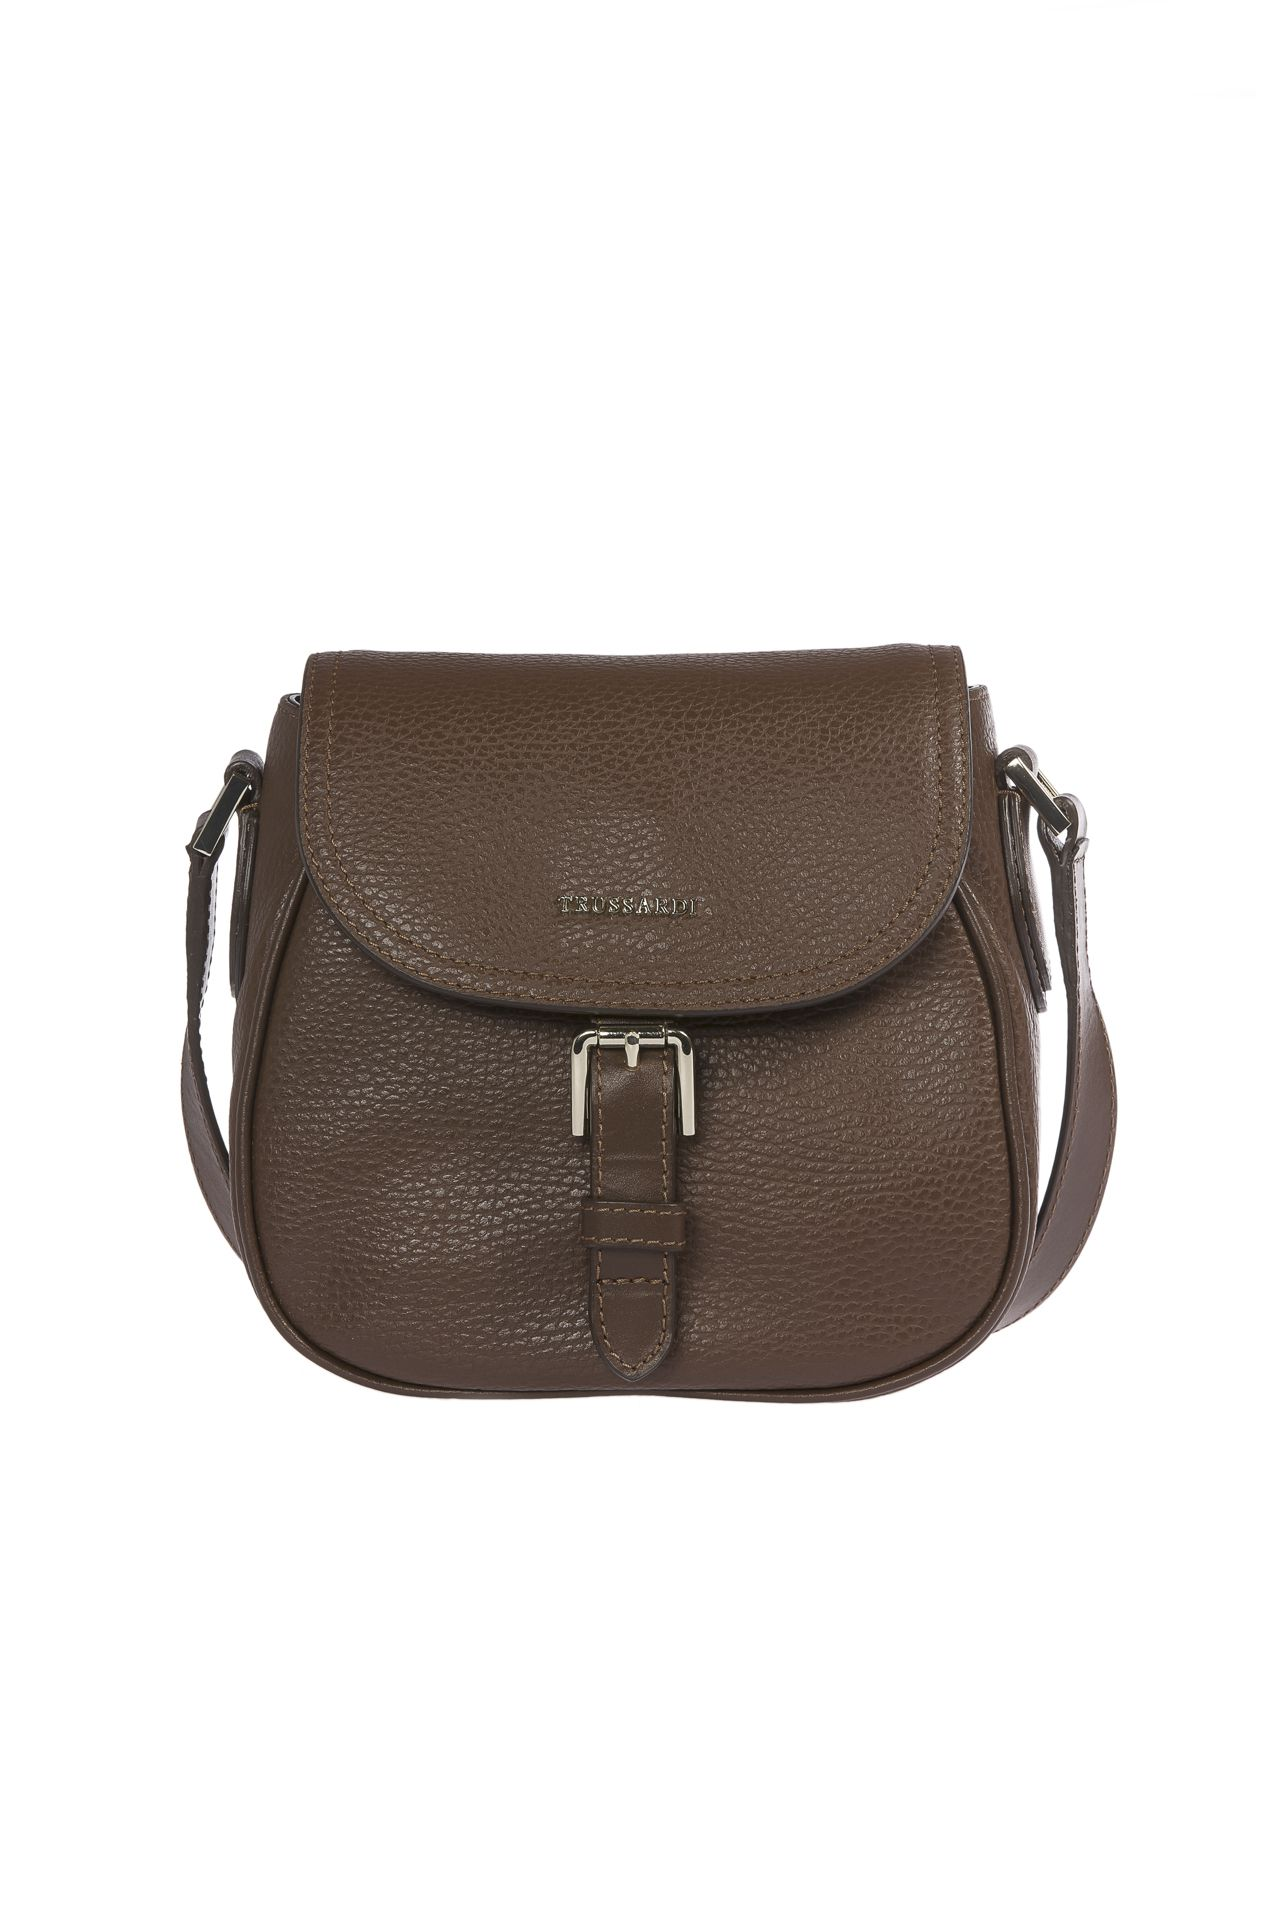 Trussardi Women's Crossbody Bag Brown 1DB513_69DarkBrown